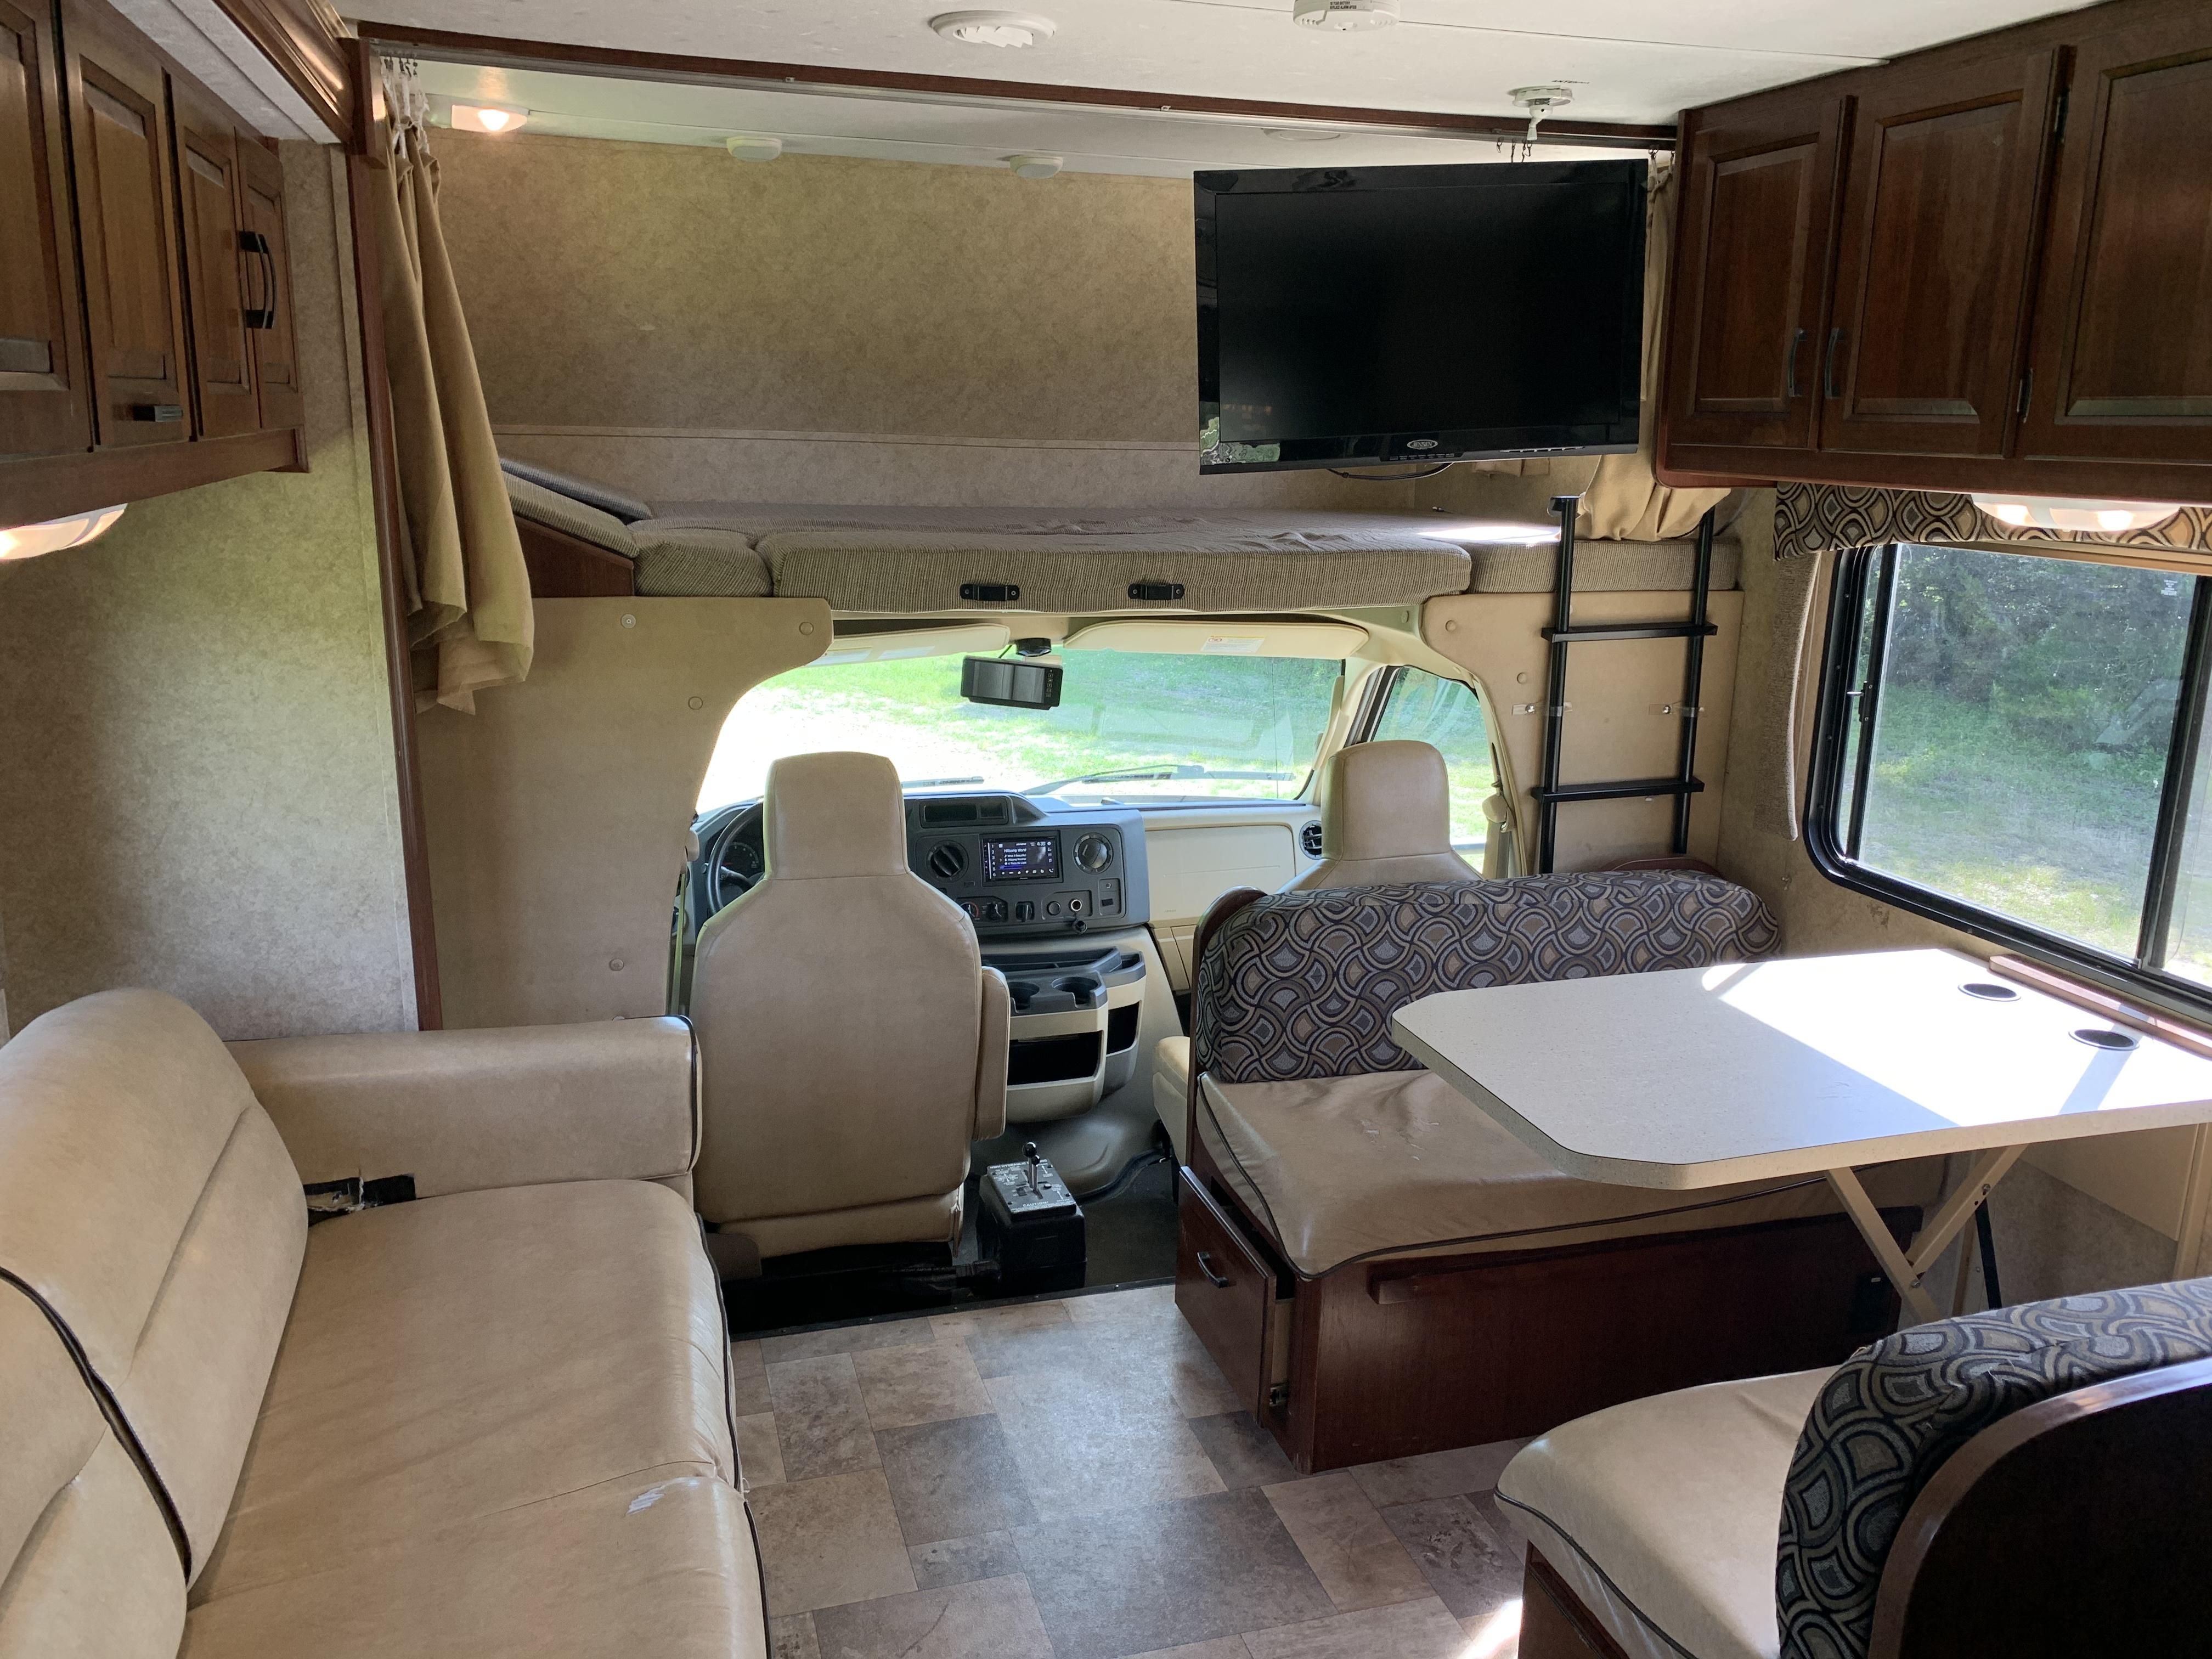 Living Room/Dining Room. Ford Forrest River Sunseeker With Slide 2014